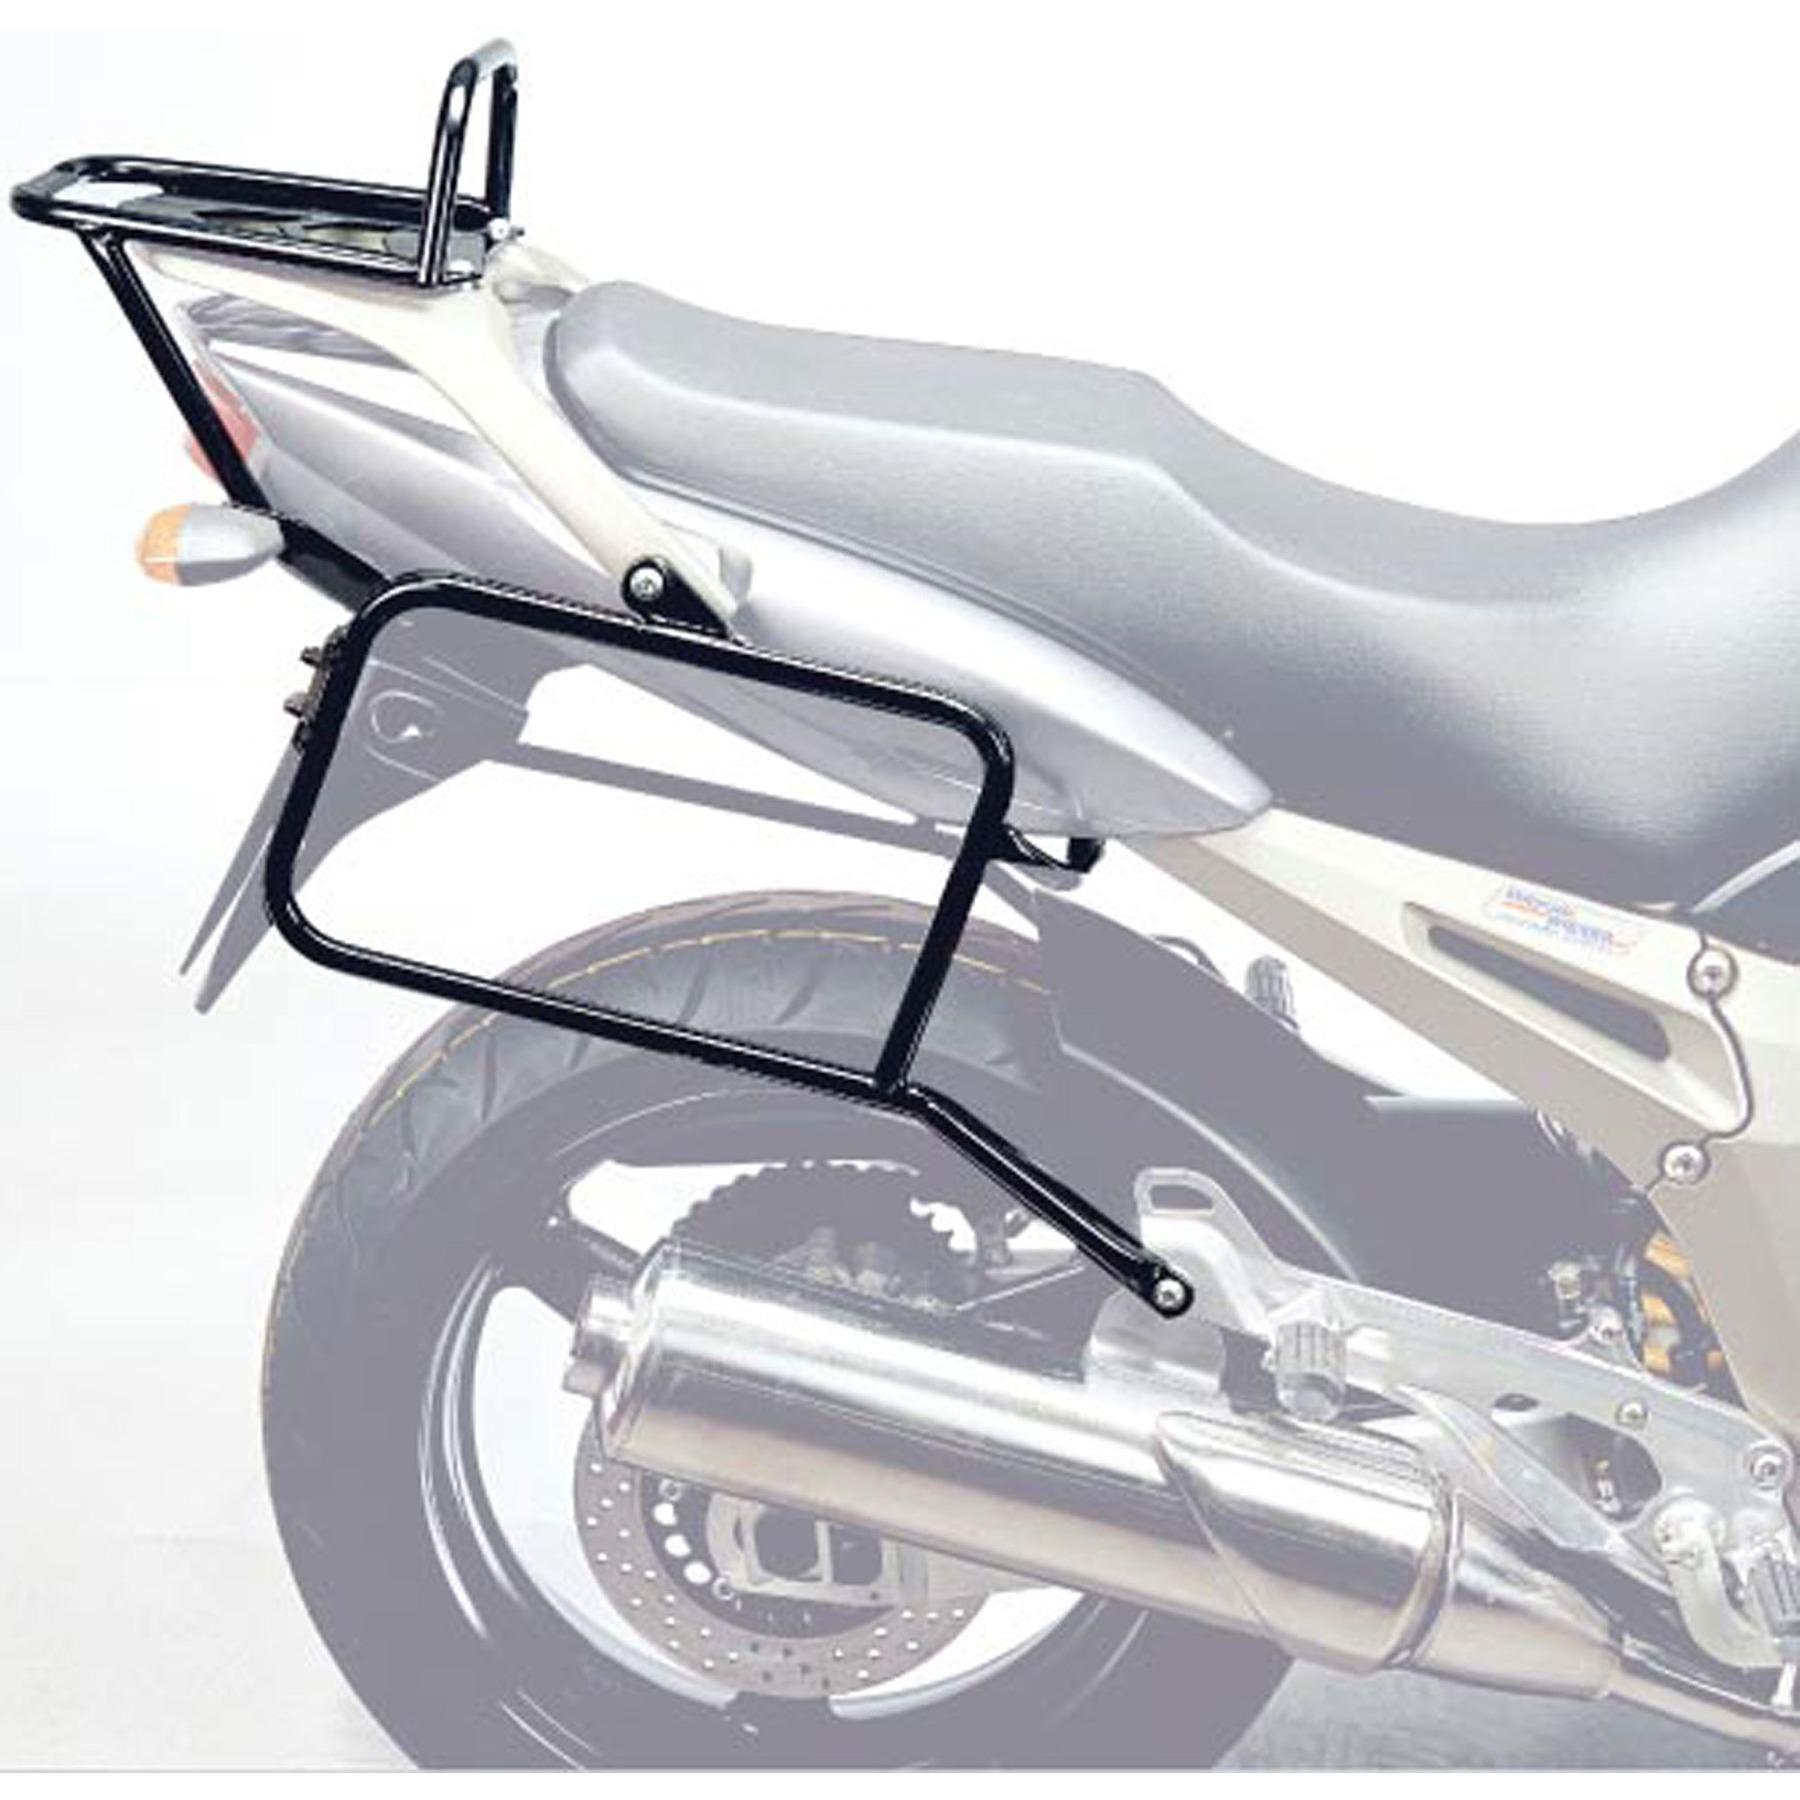 97- 86 cm, Tachowelle Kawasaki ER 5 Twister Bj